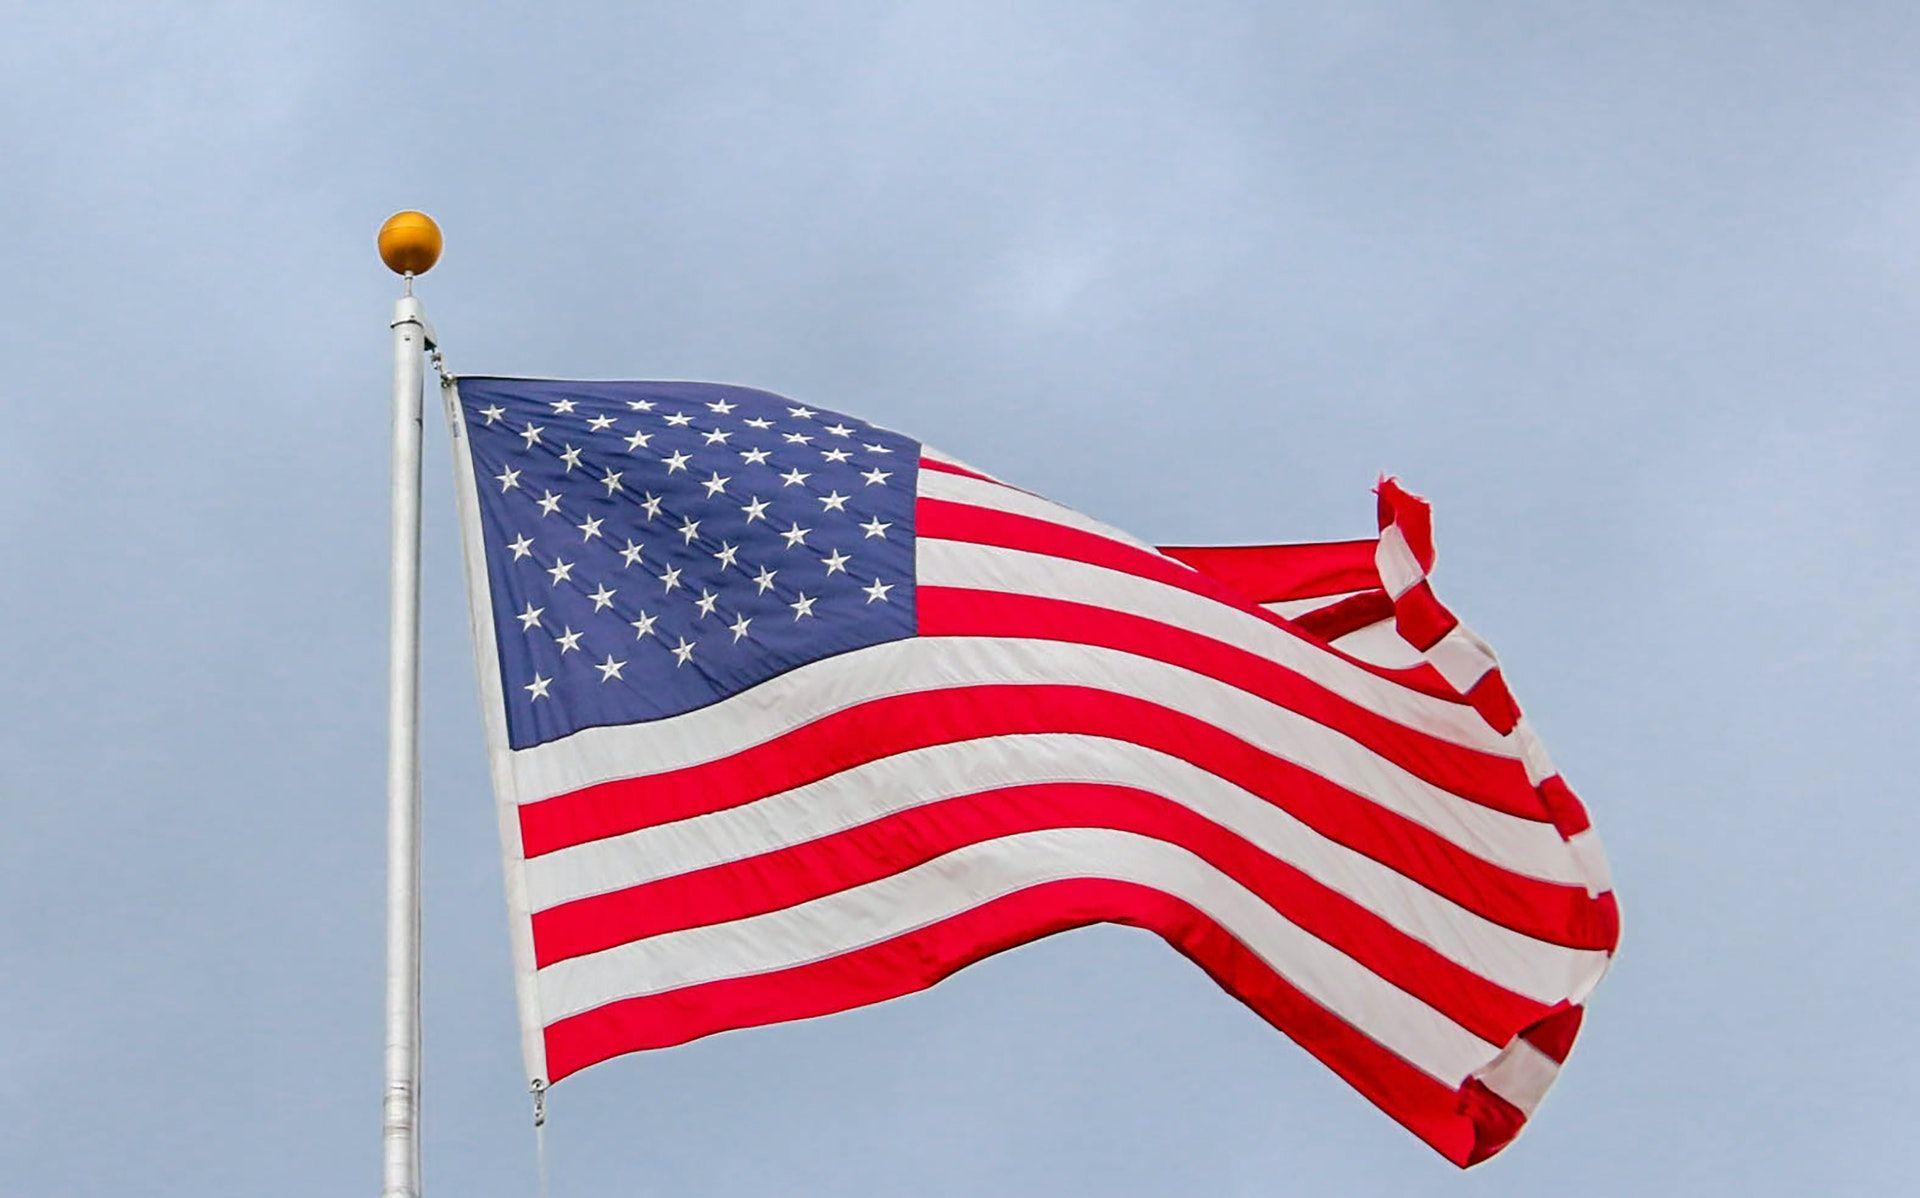 Kebijakan Pemerintahan Baru AS terhadap Dunia Islam